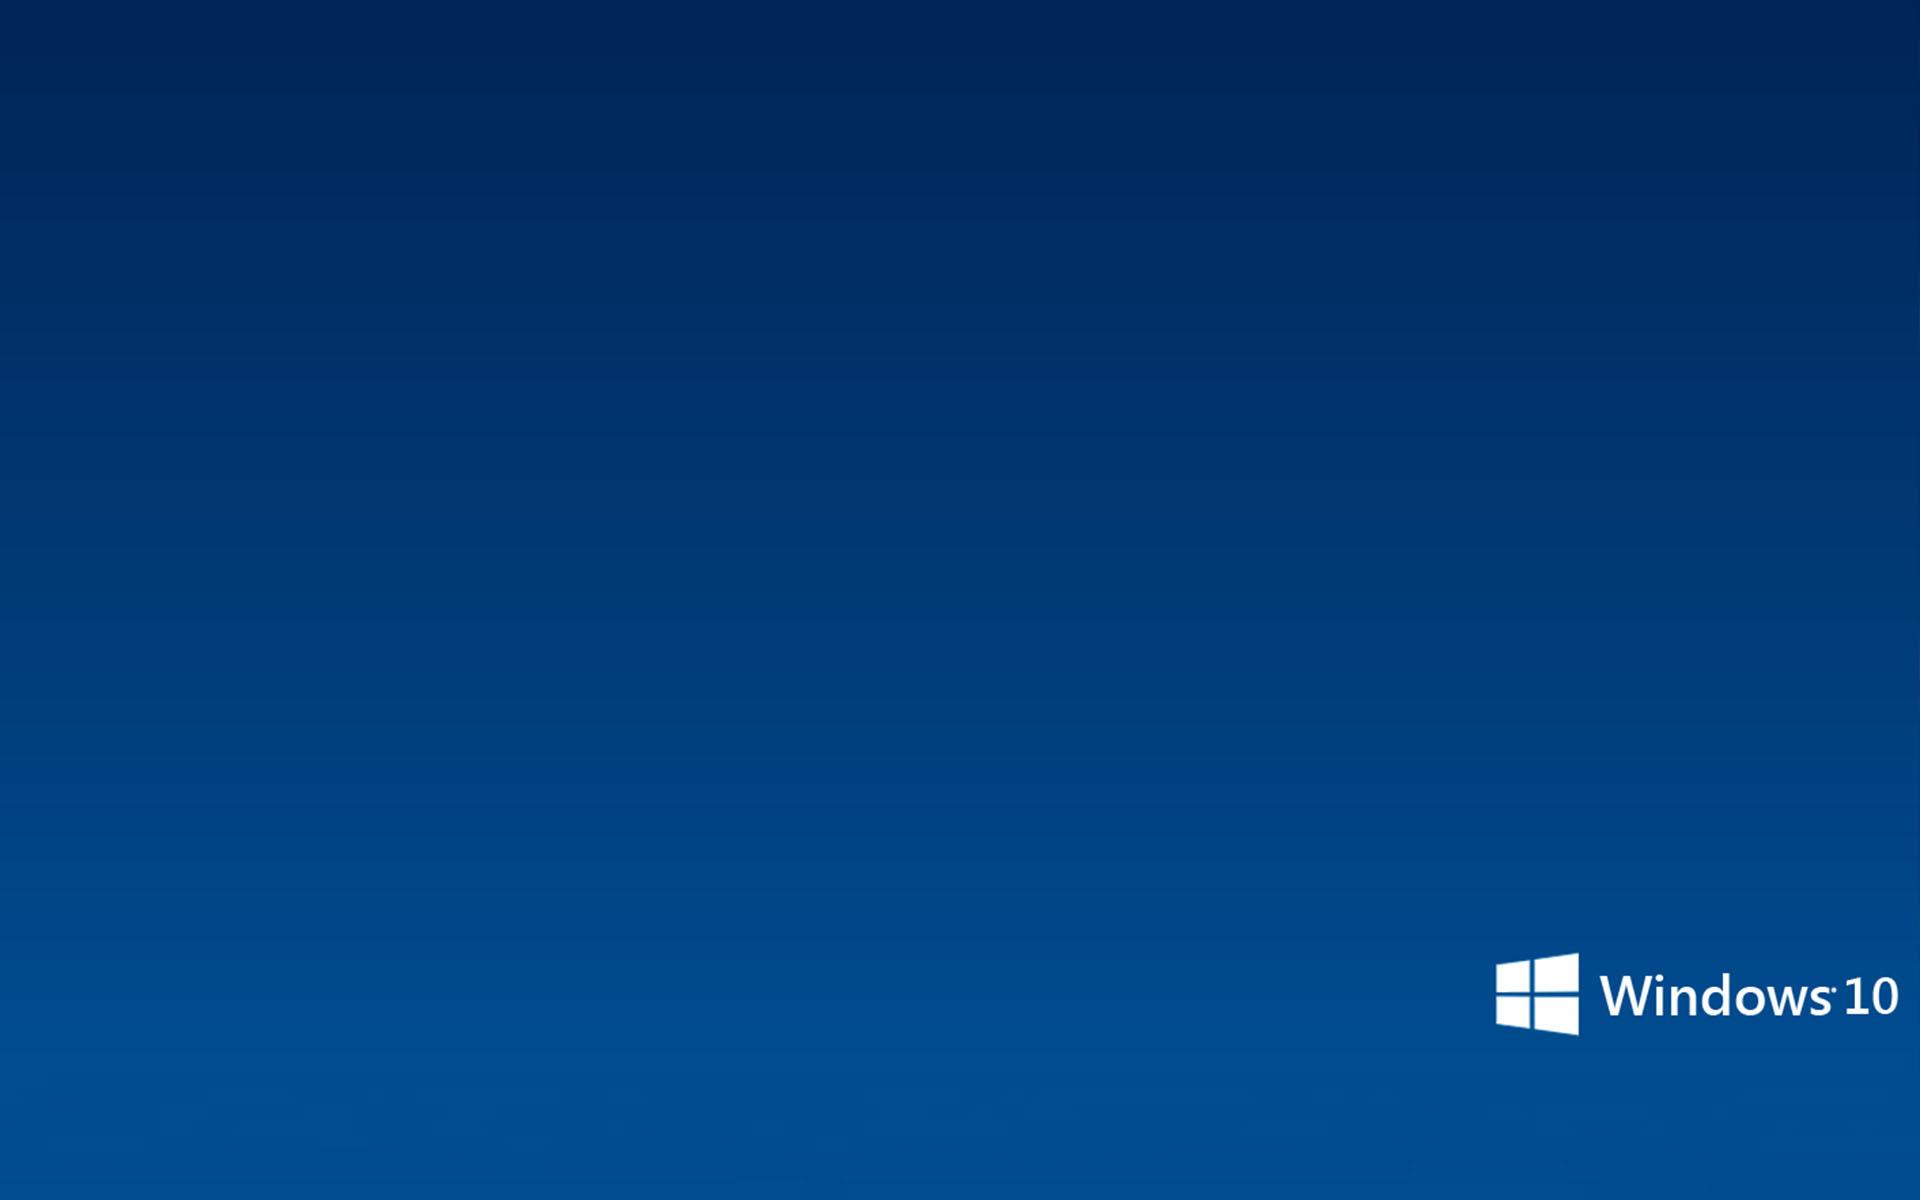 Simple Microsoft Windows 10 Wallpaper   Wallpapers 1920x1200